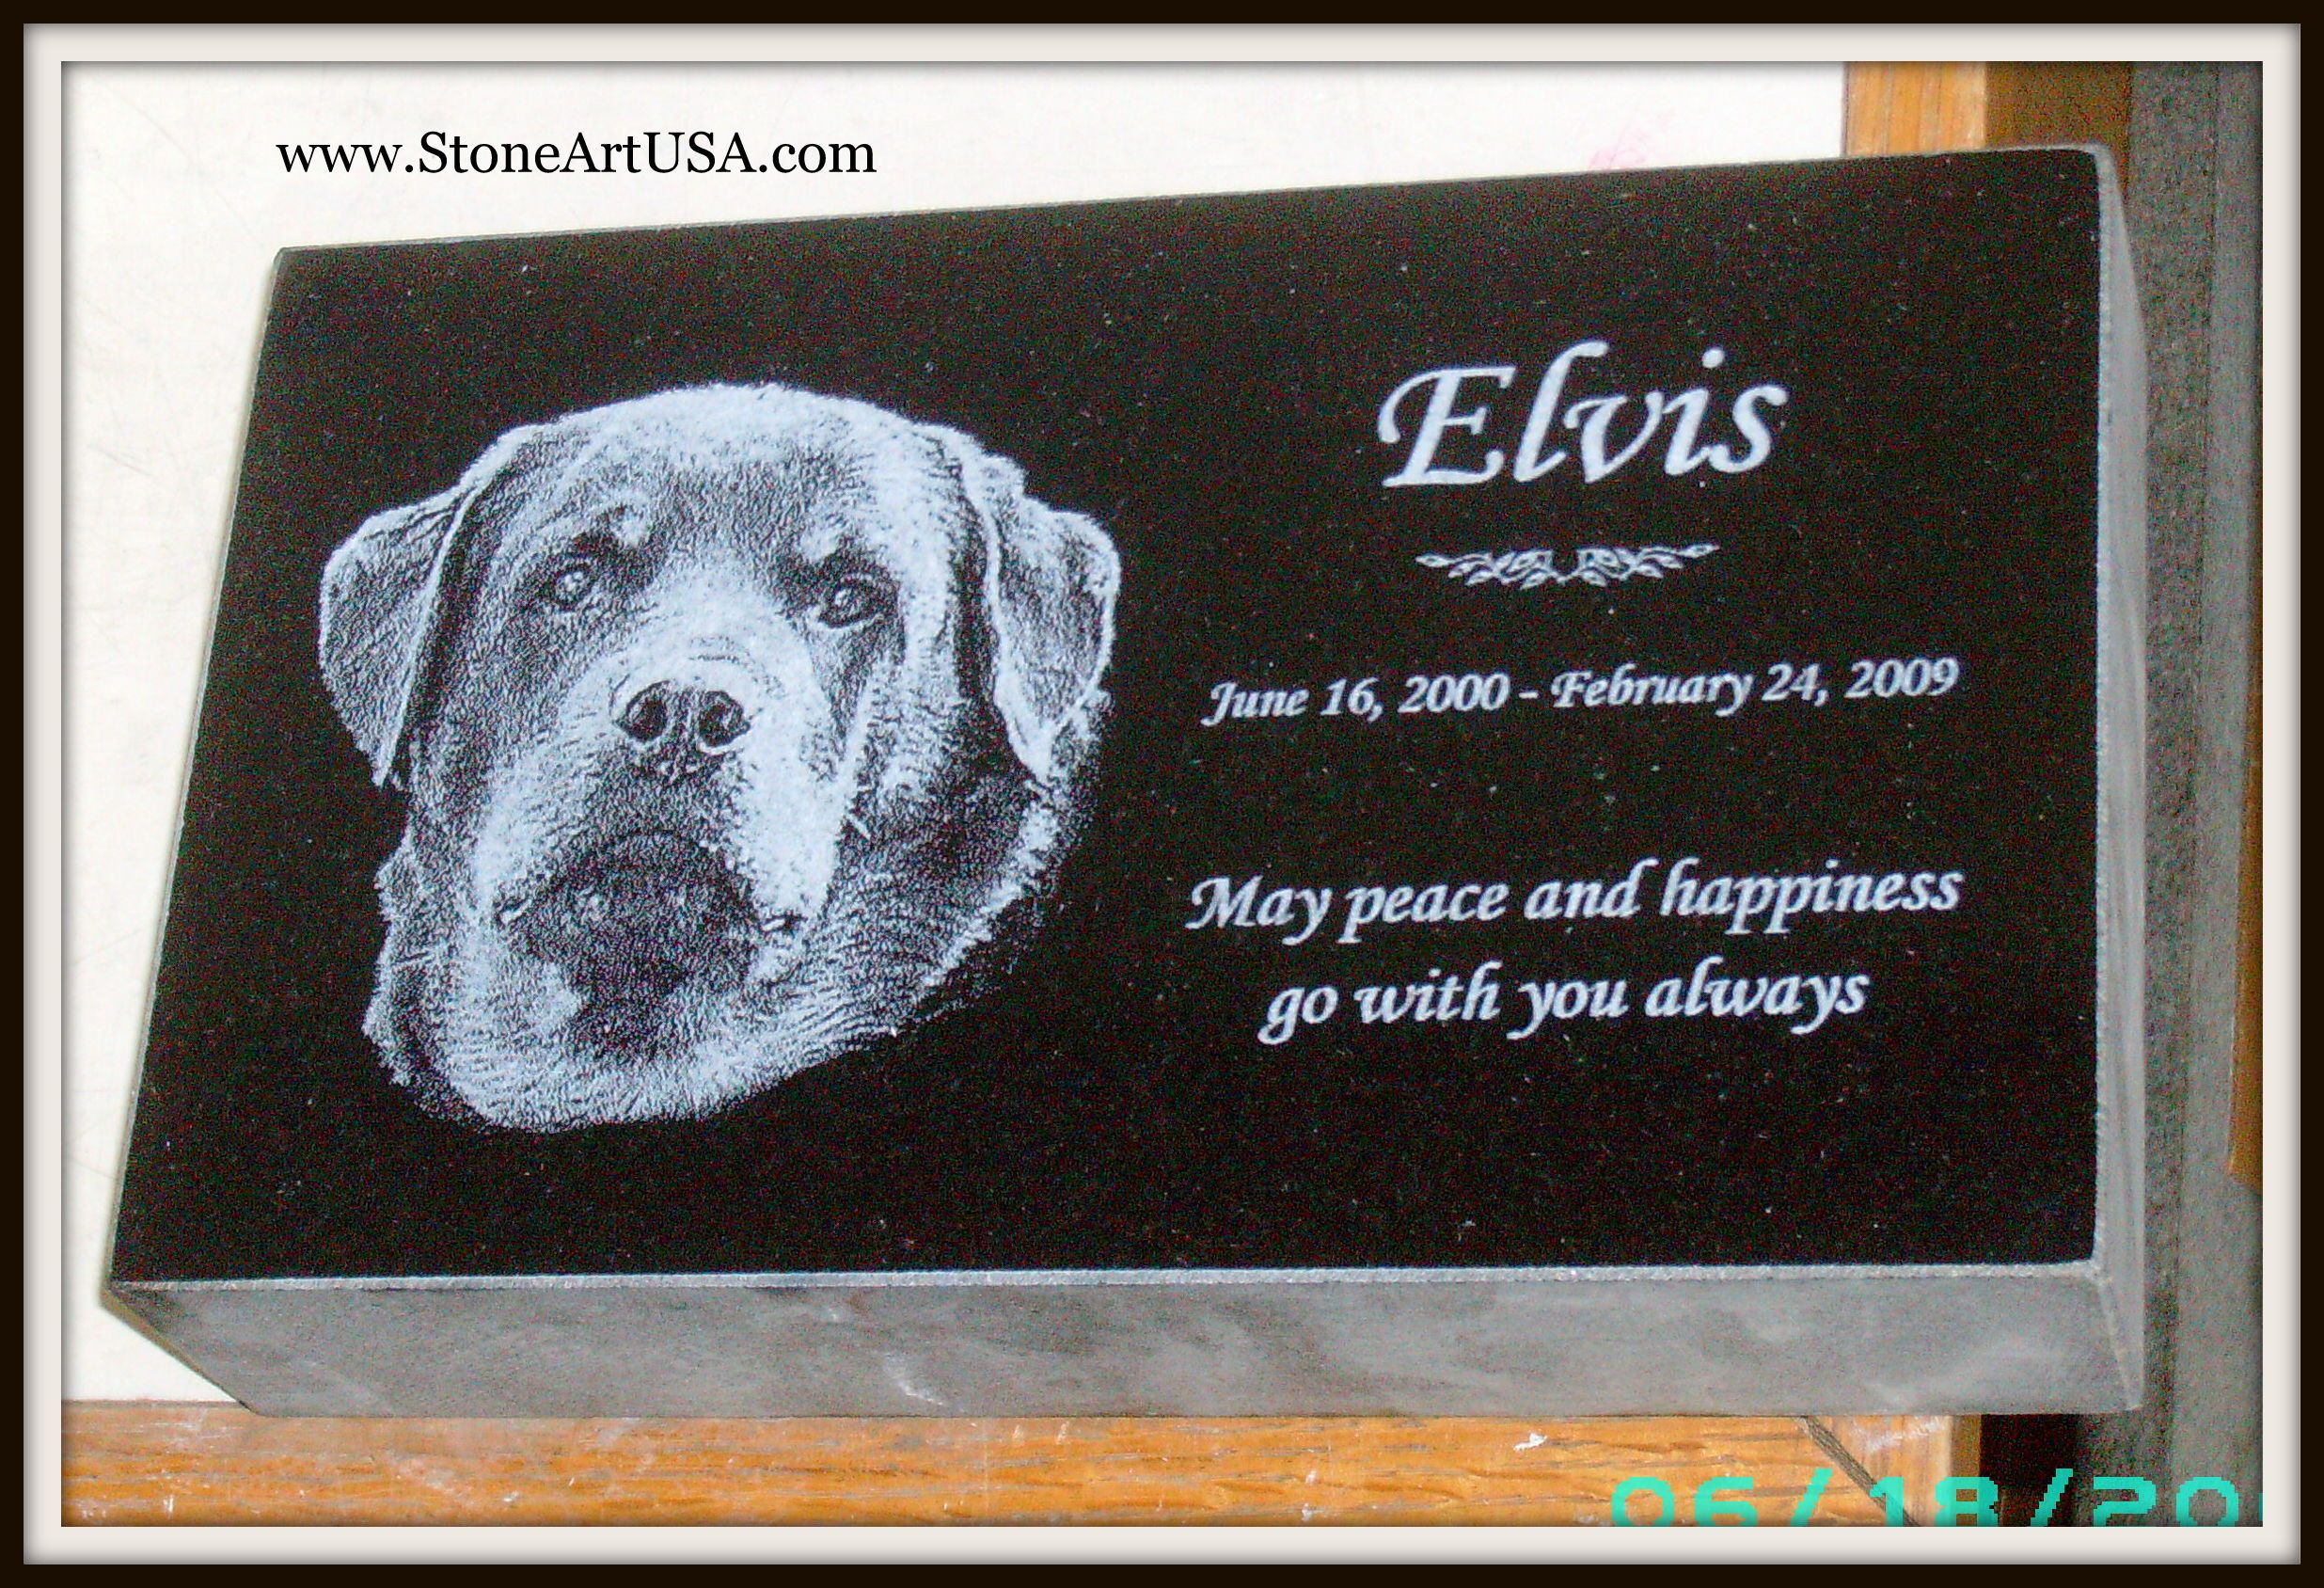 R I P Elvis New Ideas For Pet Grave Stones Custom Made Memorial Stones Cremation Urns Custom Pet Memorials Pet Memorial Stones Granite Pet Memorials